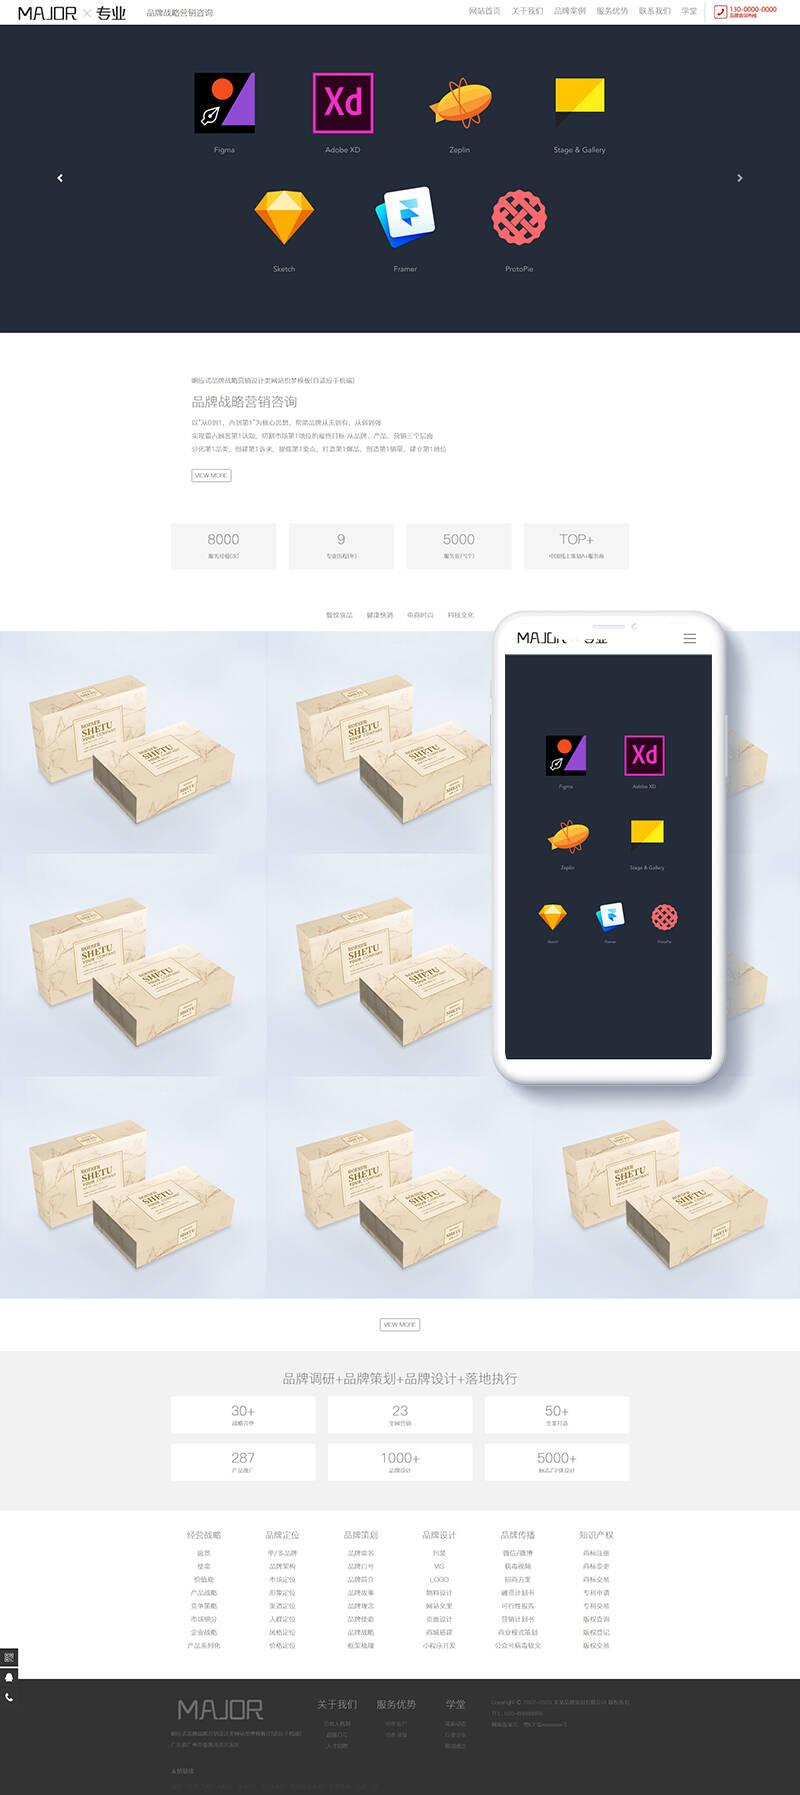 D84【织梦模板】dedecms织梦模板源码品牌策略营销推广设计网站模板[含手机移动版]